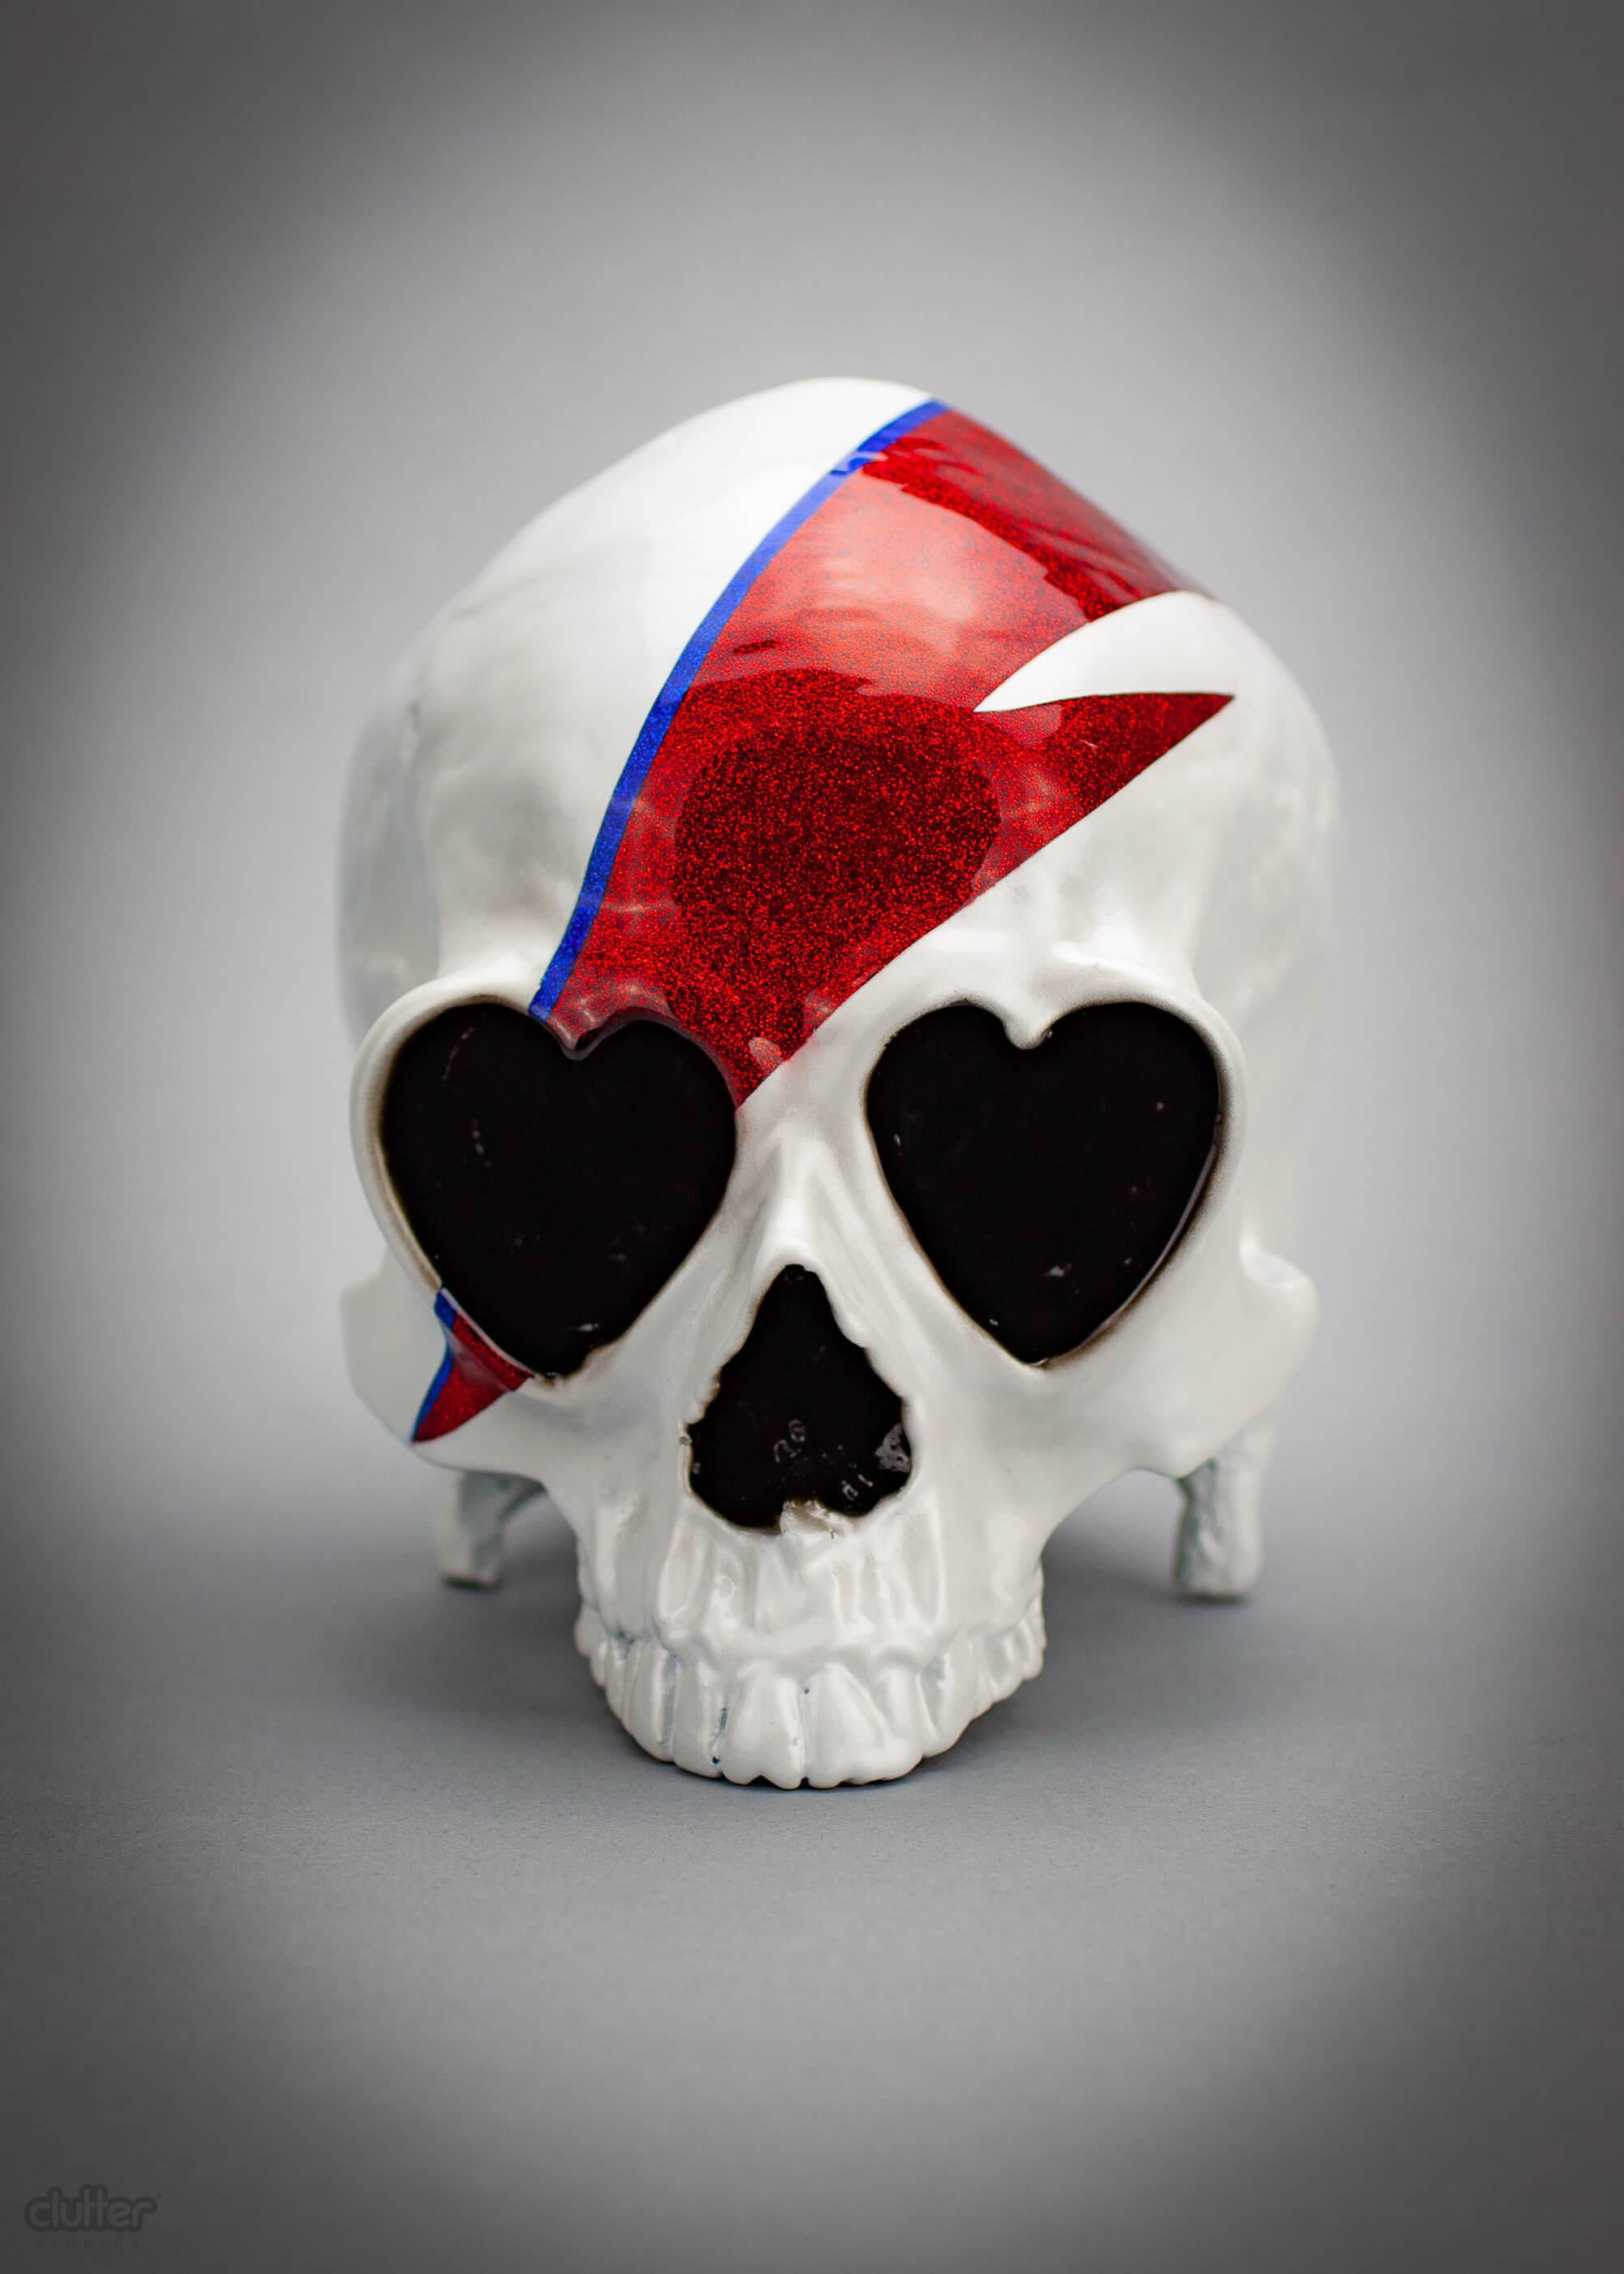 rebel-rebel-heart-skull-ron-english-clutter-3